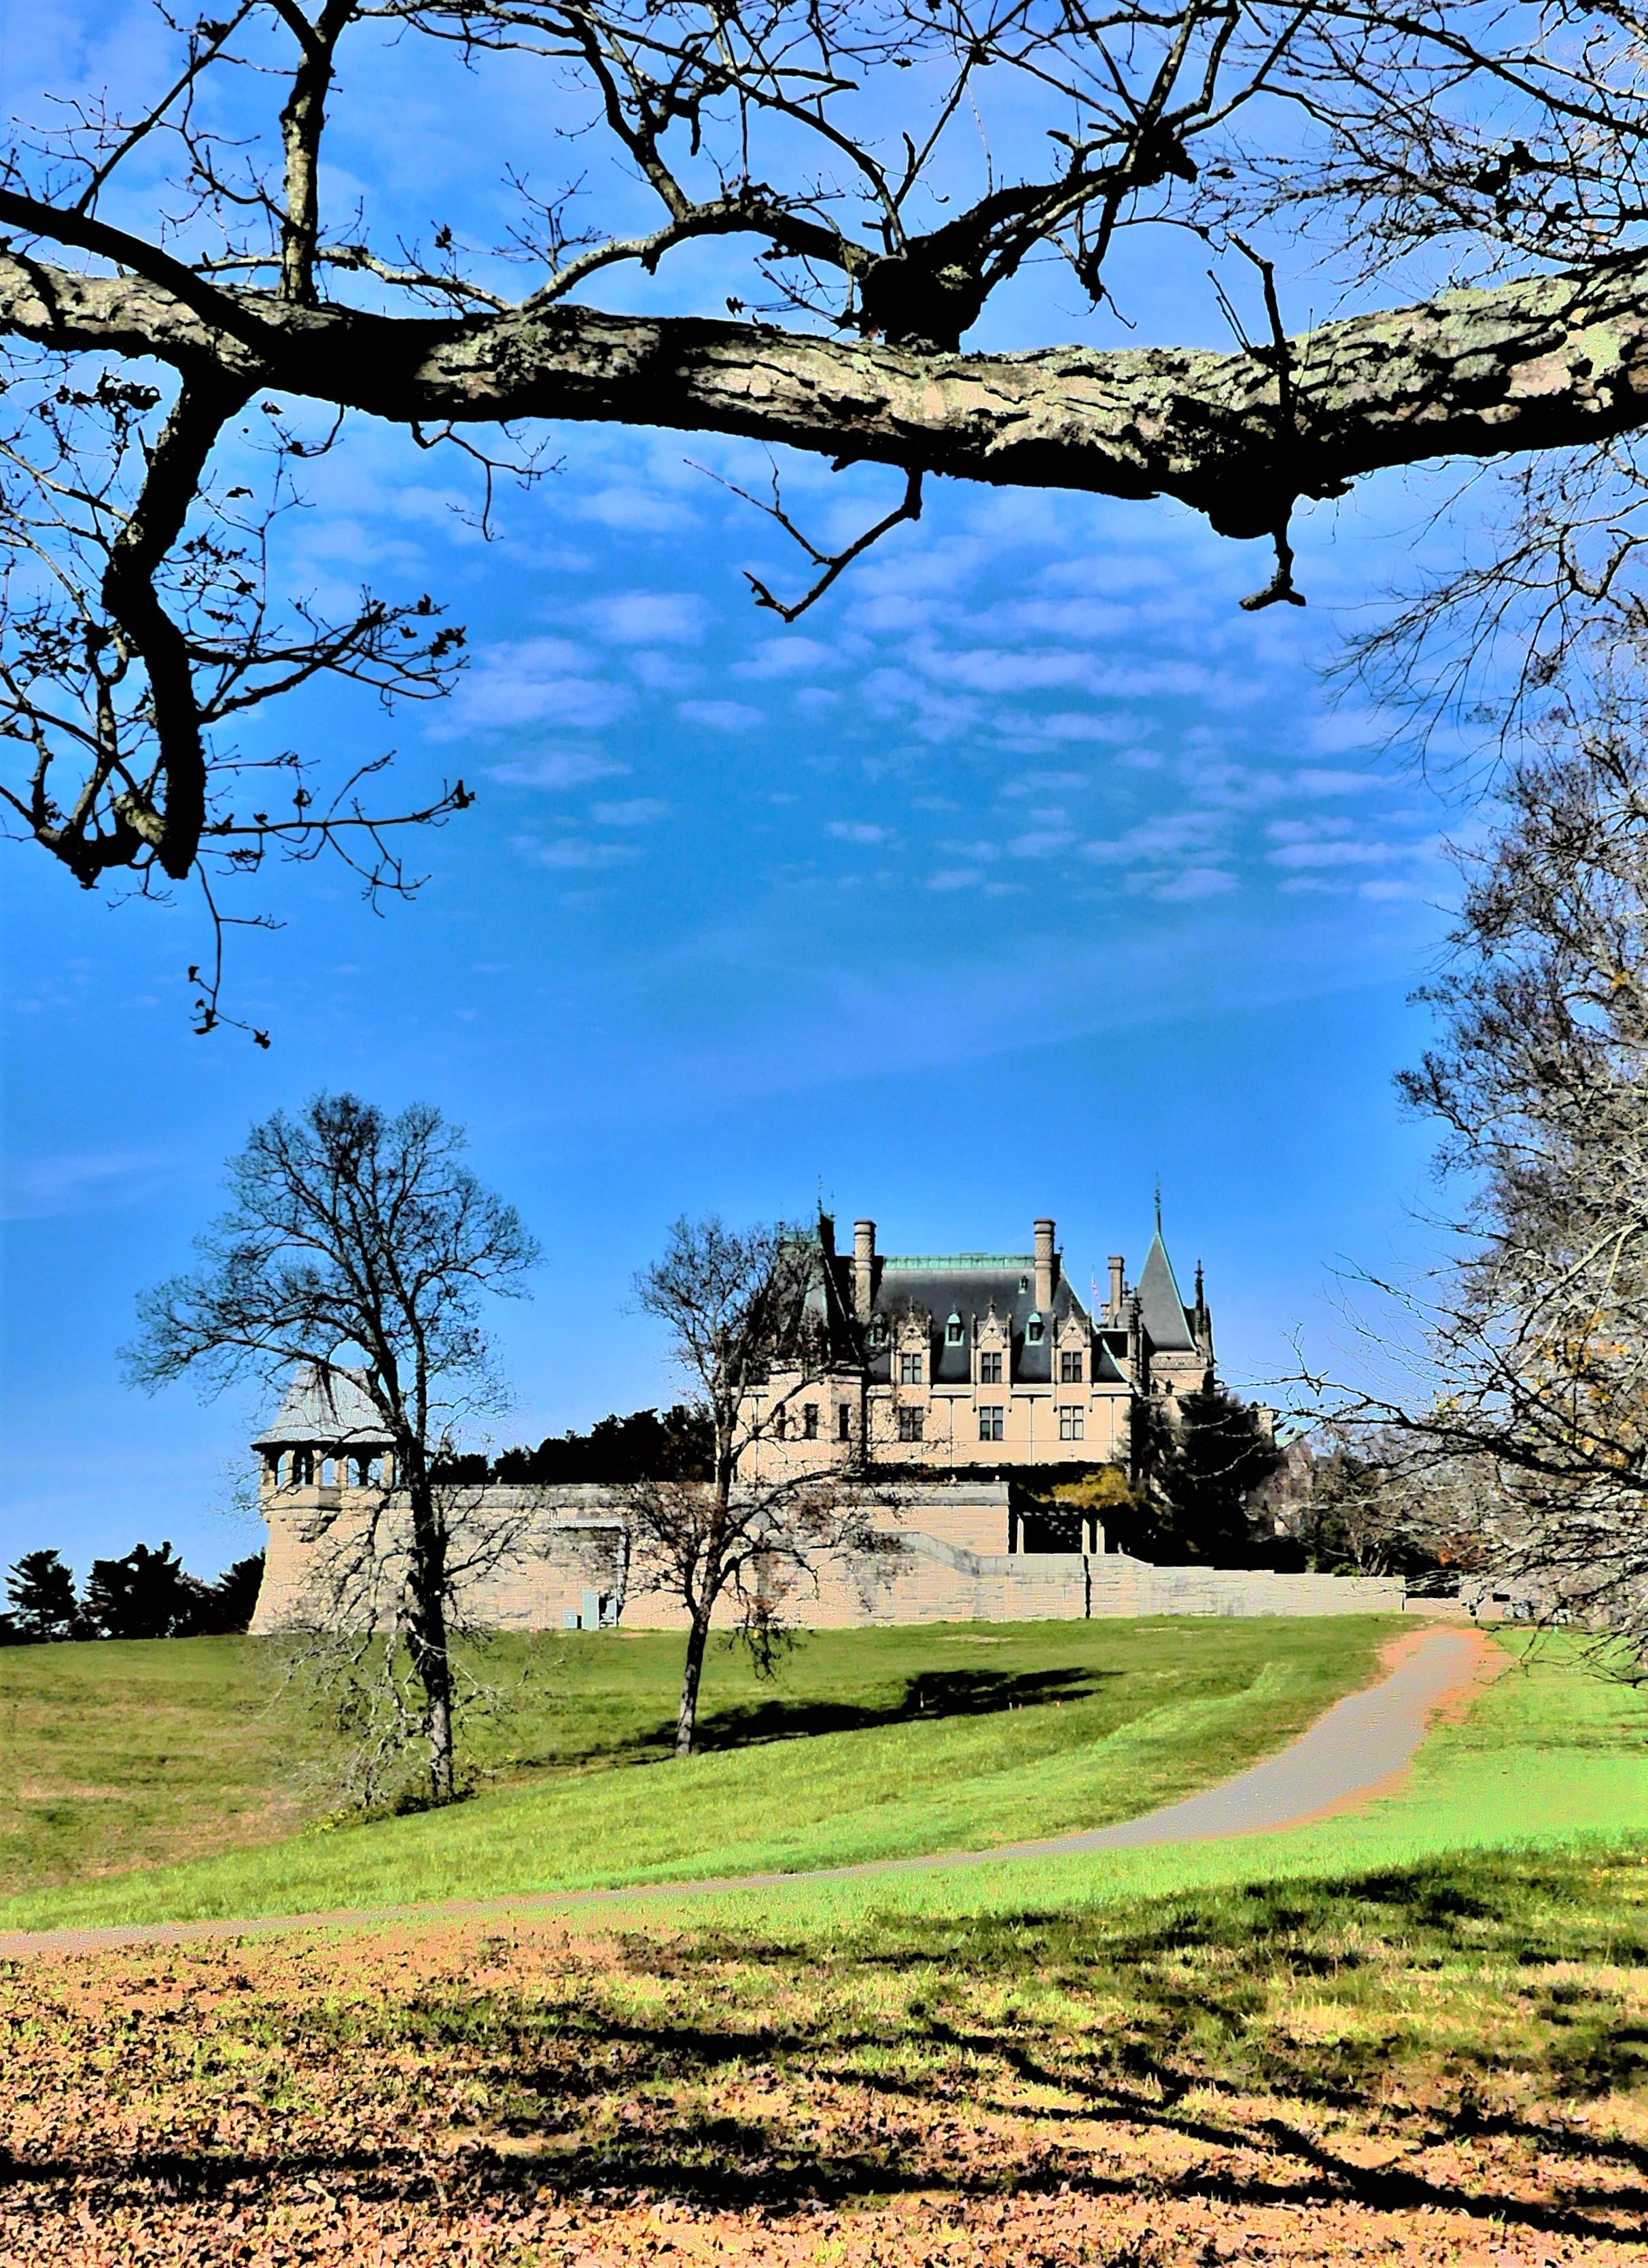 Biltmore Castle